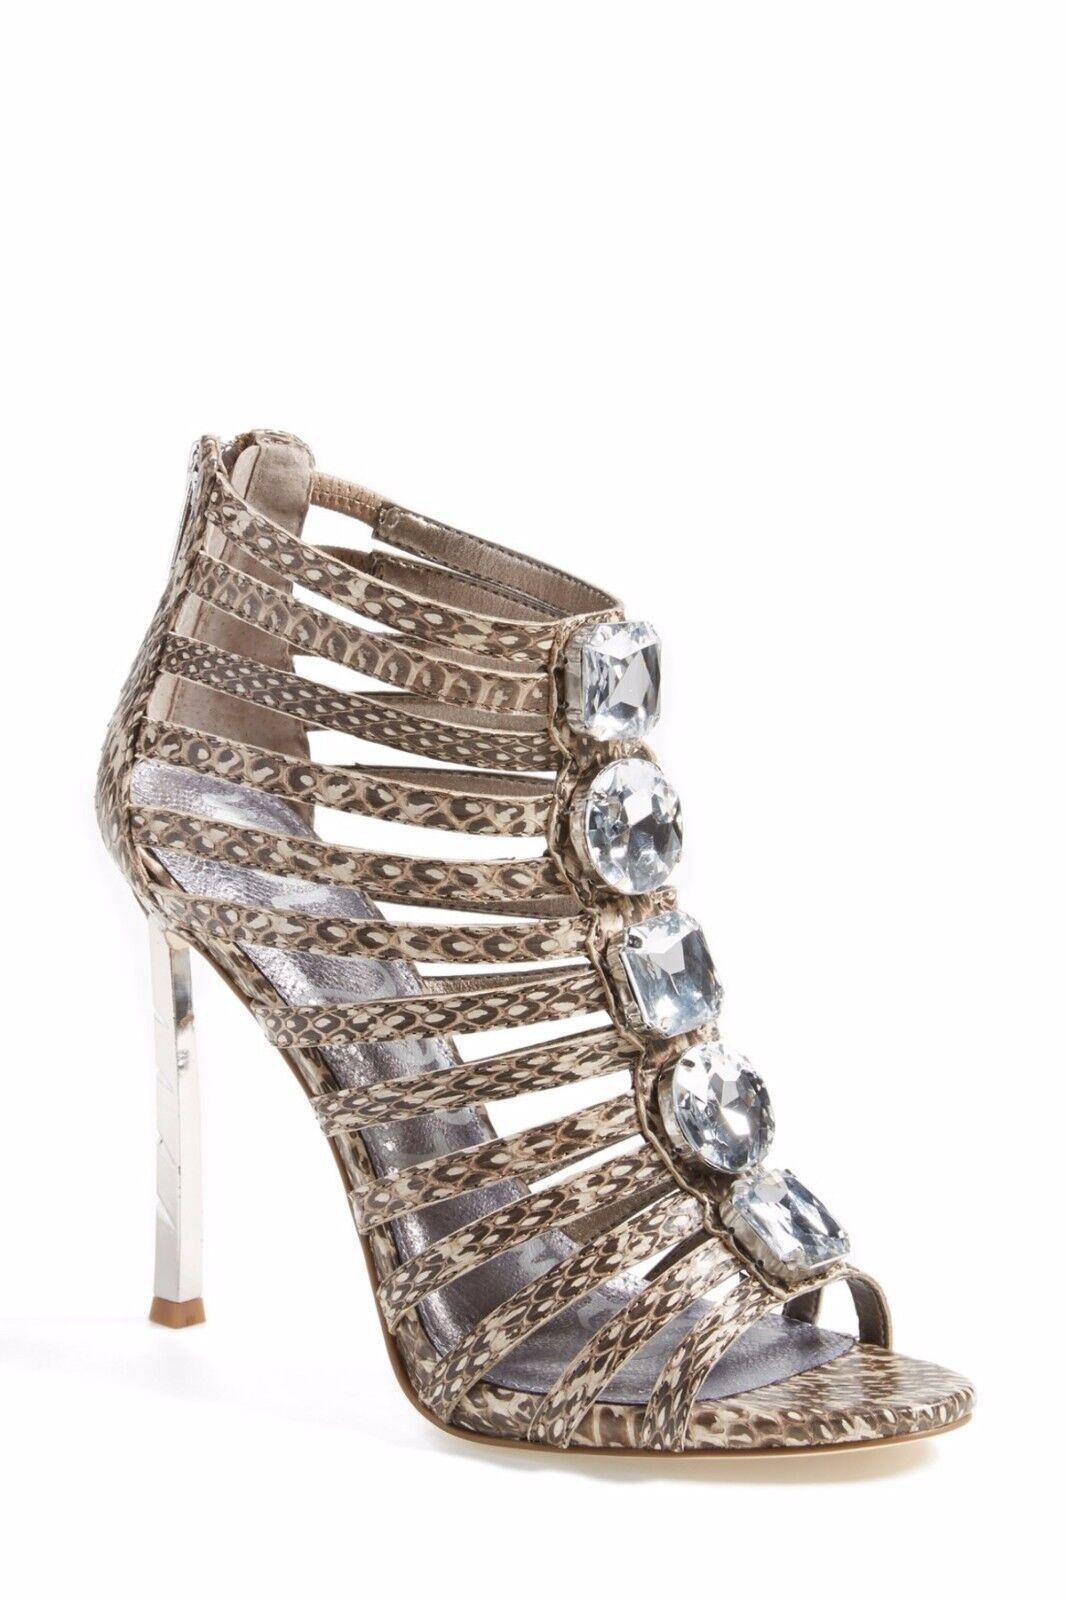 Sam Edelman Dimensione 9 Hampton Leather Snakeskin Print Caged Sandal Heel scarpe  169